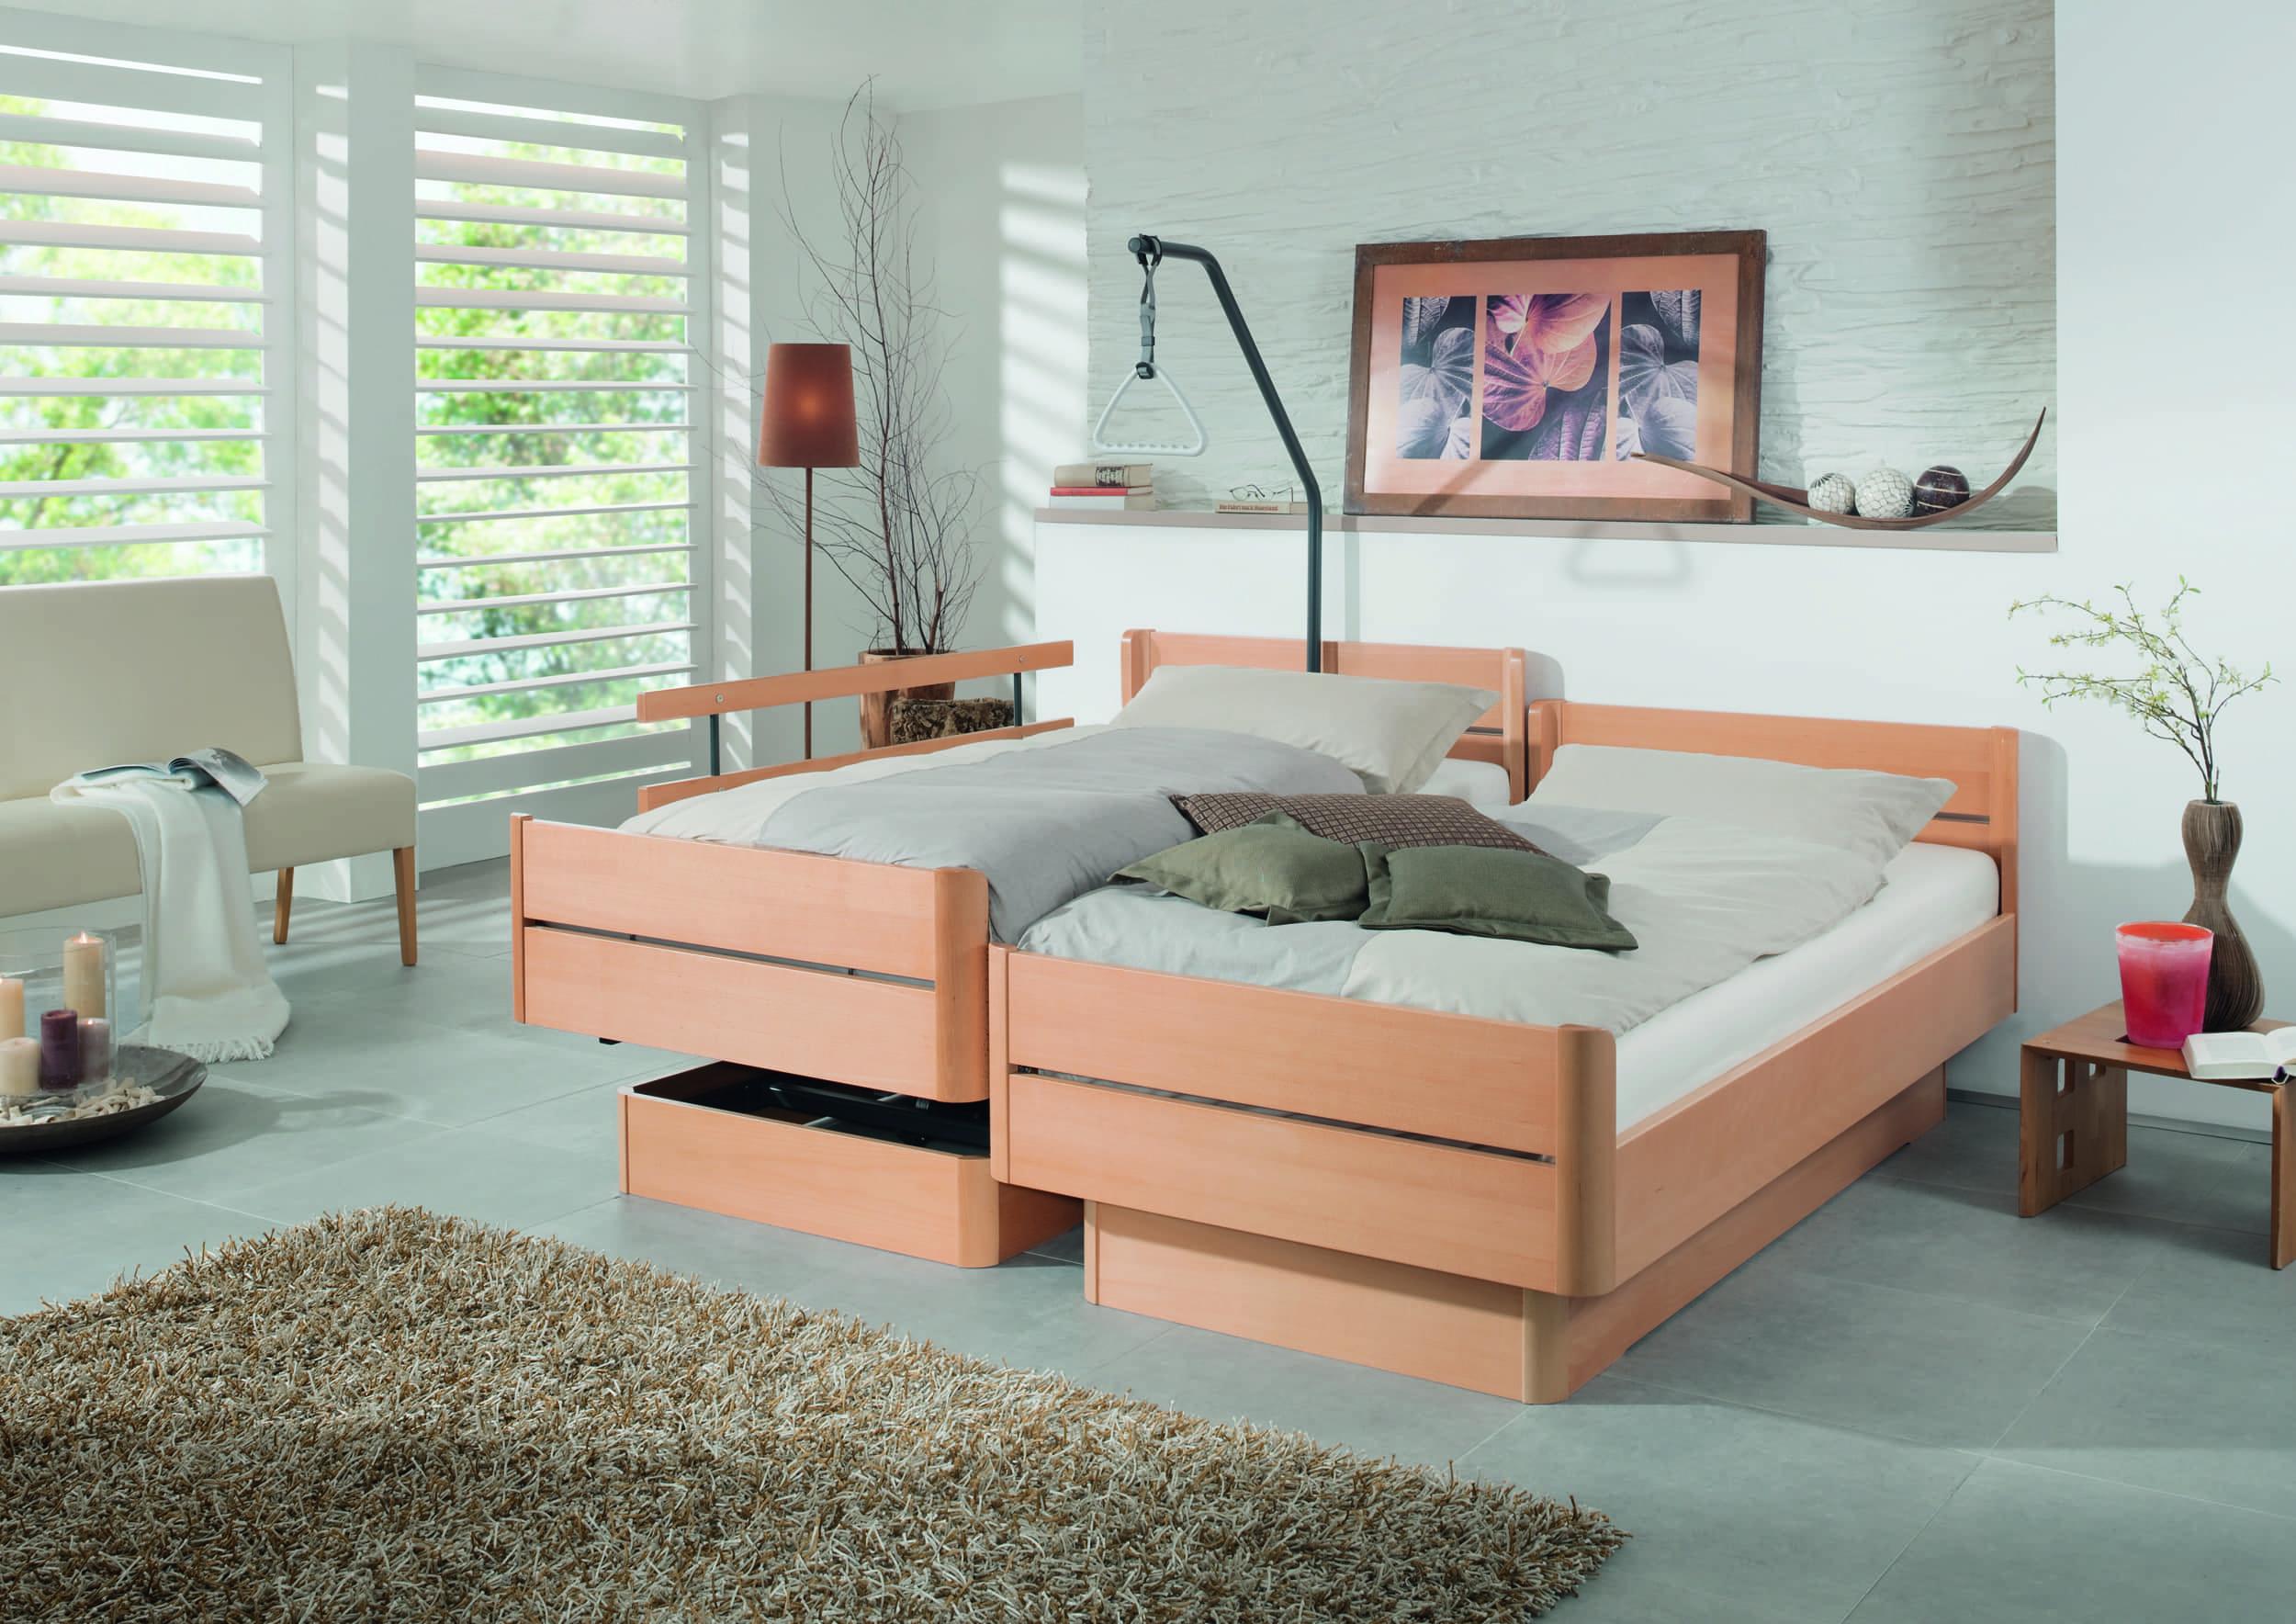 kirchner comfortbetten vom fachh ndler hillebrand liegen. Black Bedroom Furniture Sets. Home Design Ideas